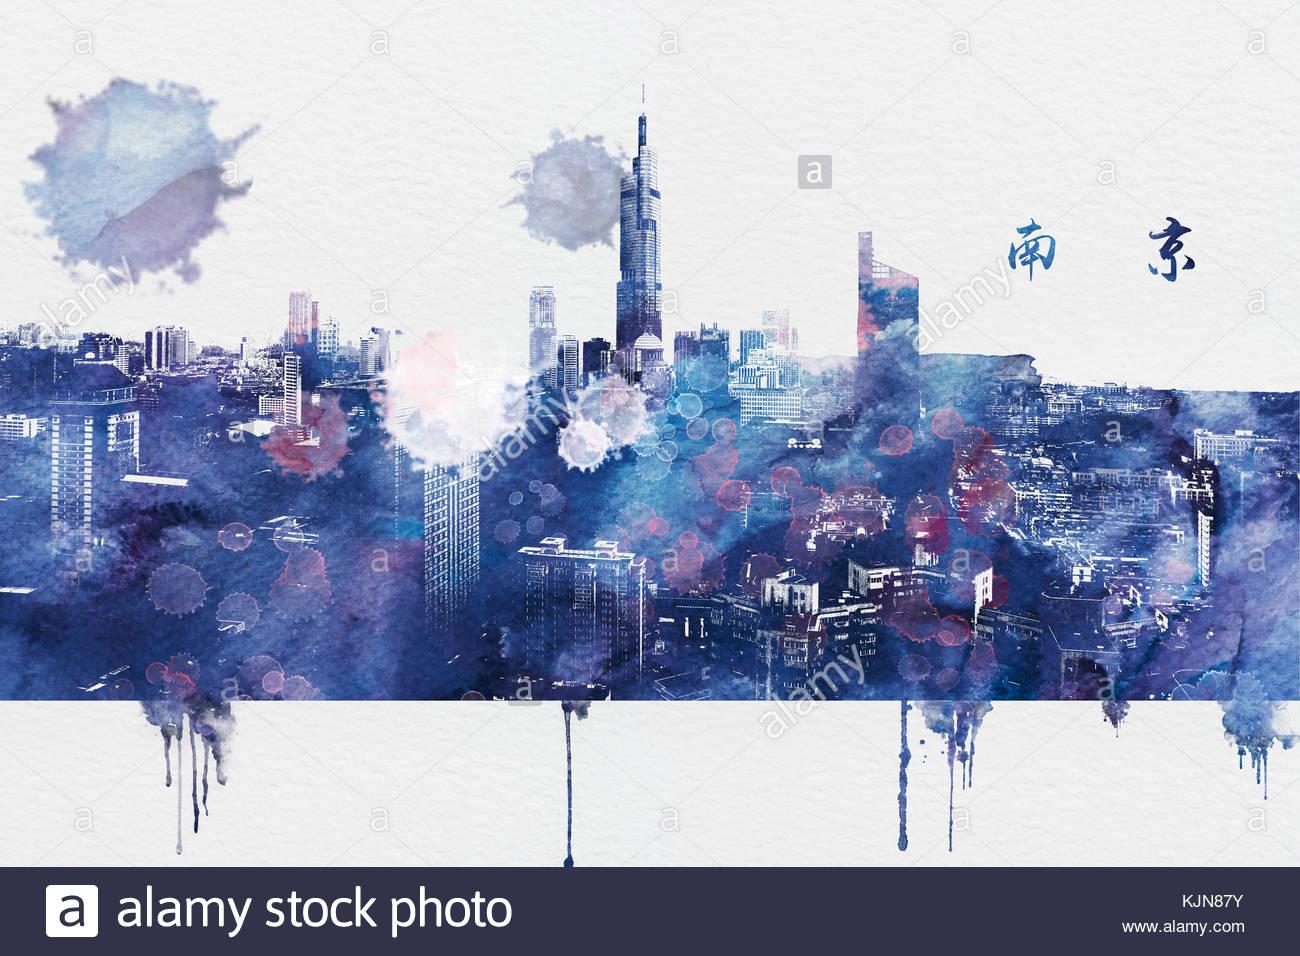 Nanjing ink painting - Stock Image